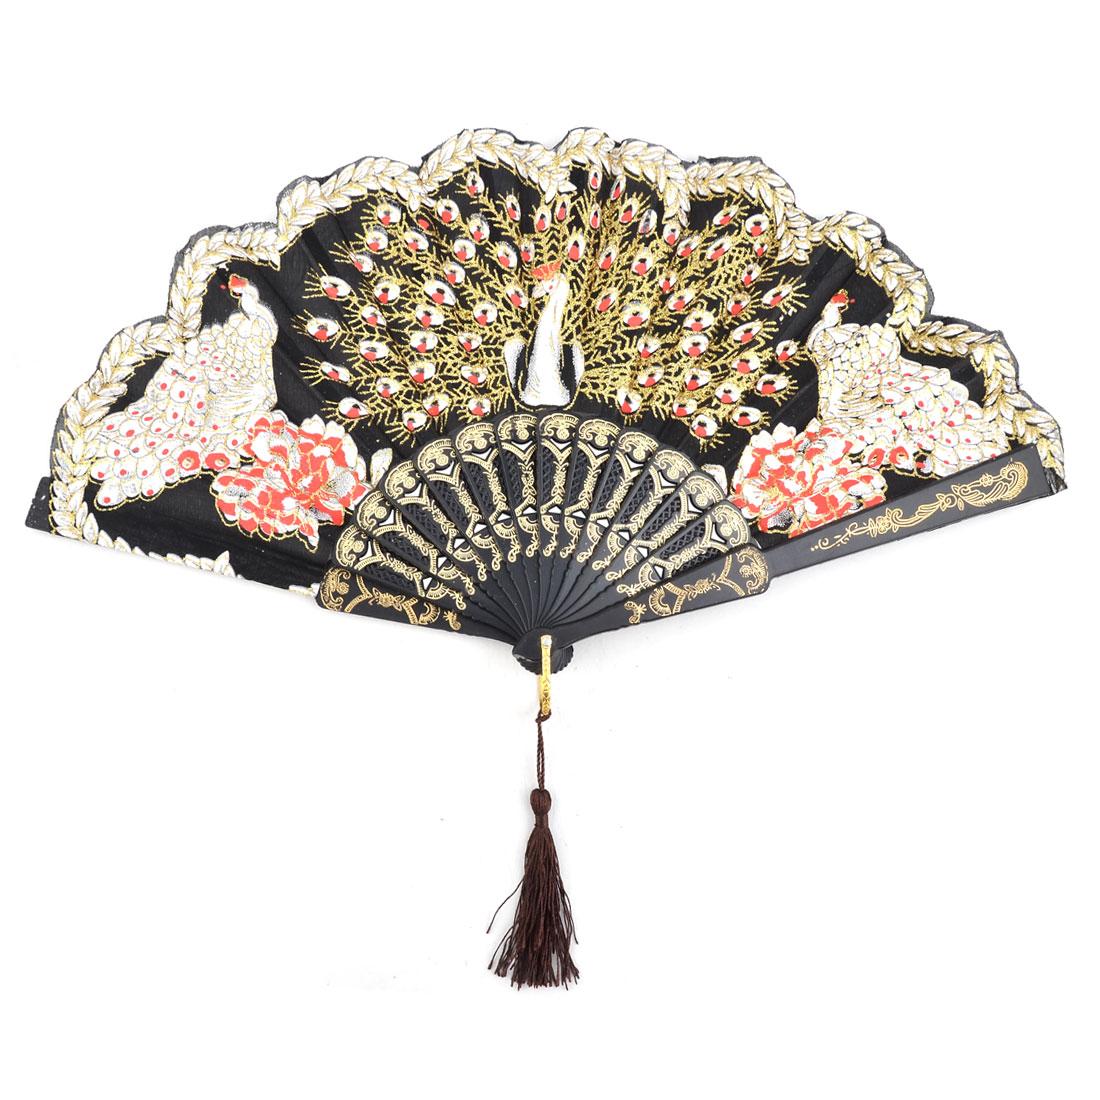 Home Wedding Plastic Frame Flower Pattern Folding Cooling Dancing Hand Fan Colorful